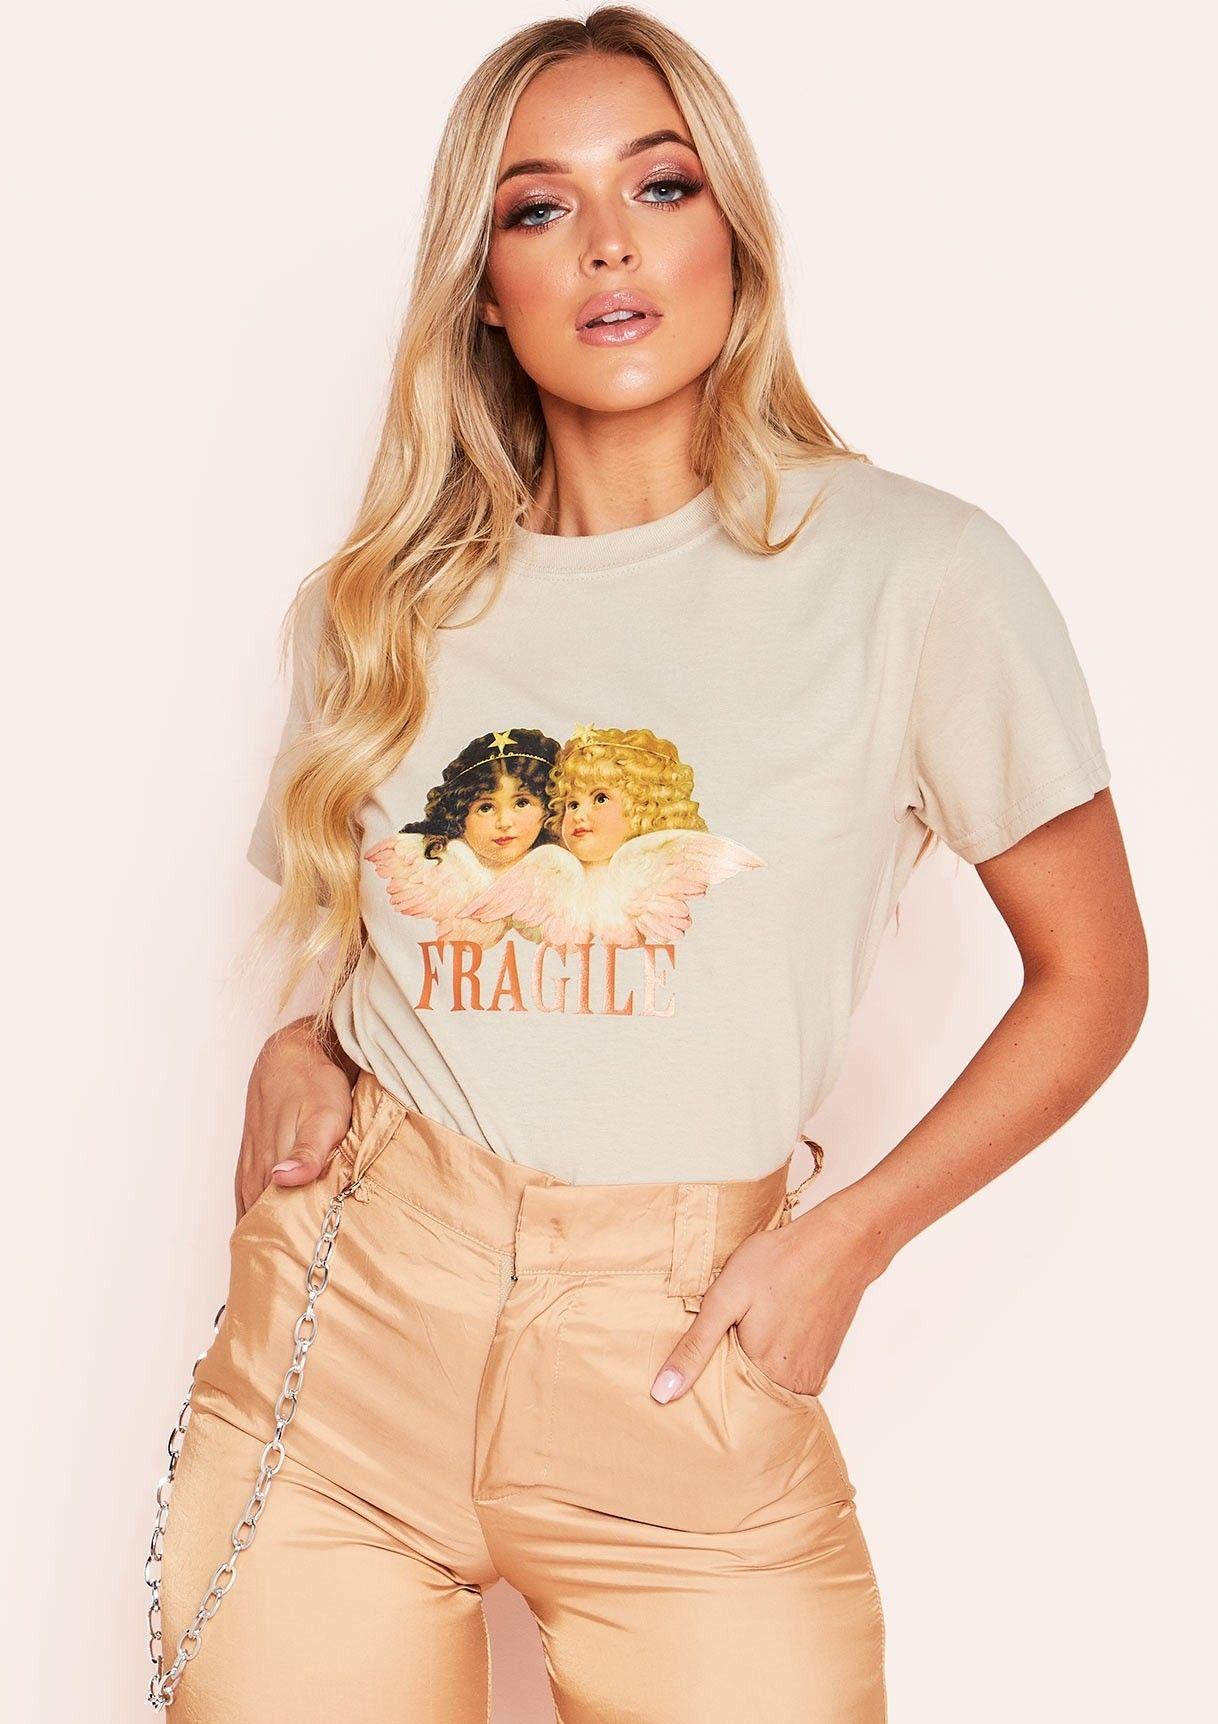 9ebdb2c2511d Missyempire - Gina Sand Fragile Graphic T-Shirt | ⚡ step up ...